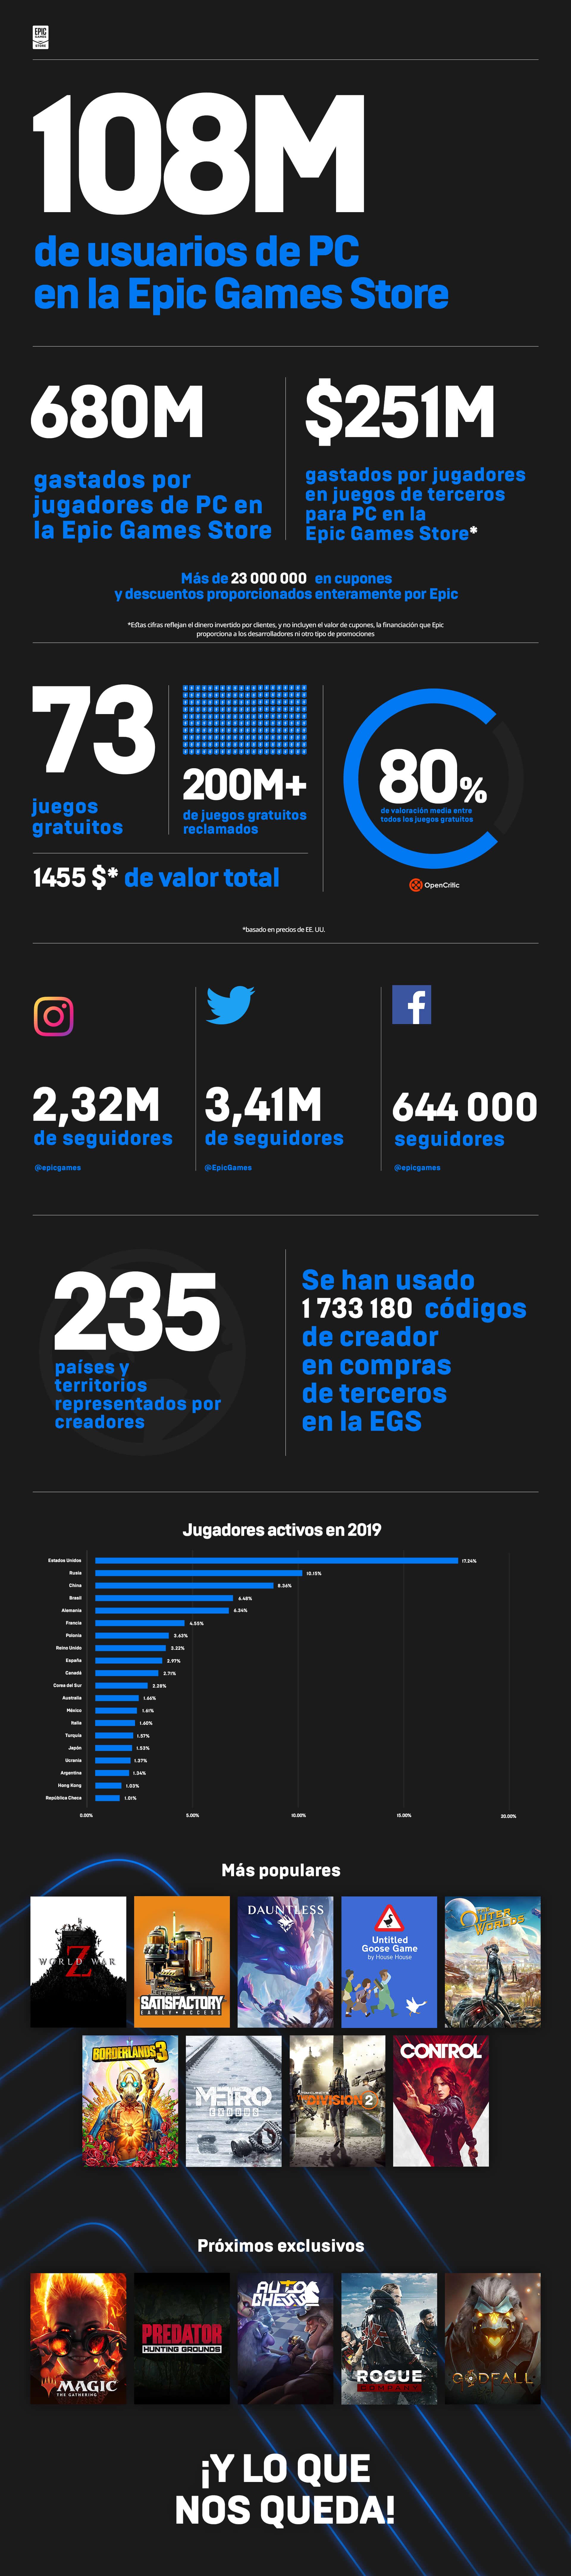 ES_ES_EGS_Infographic.jpg